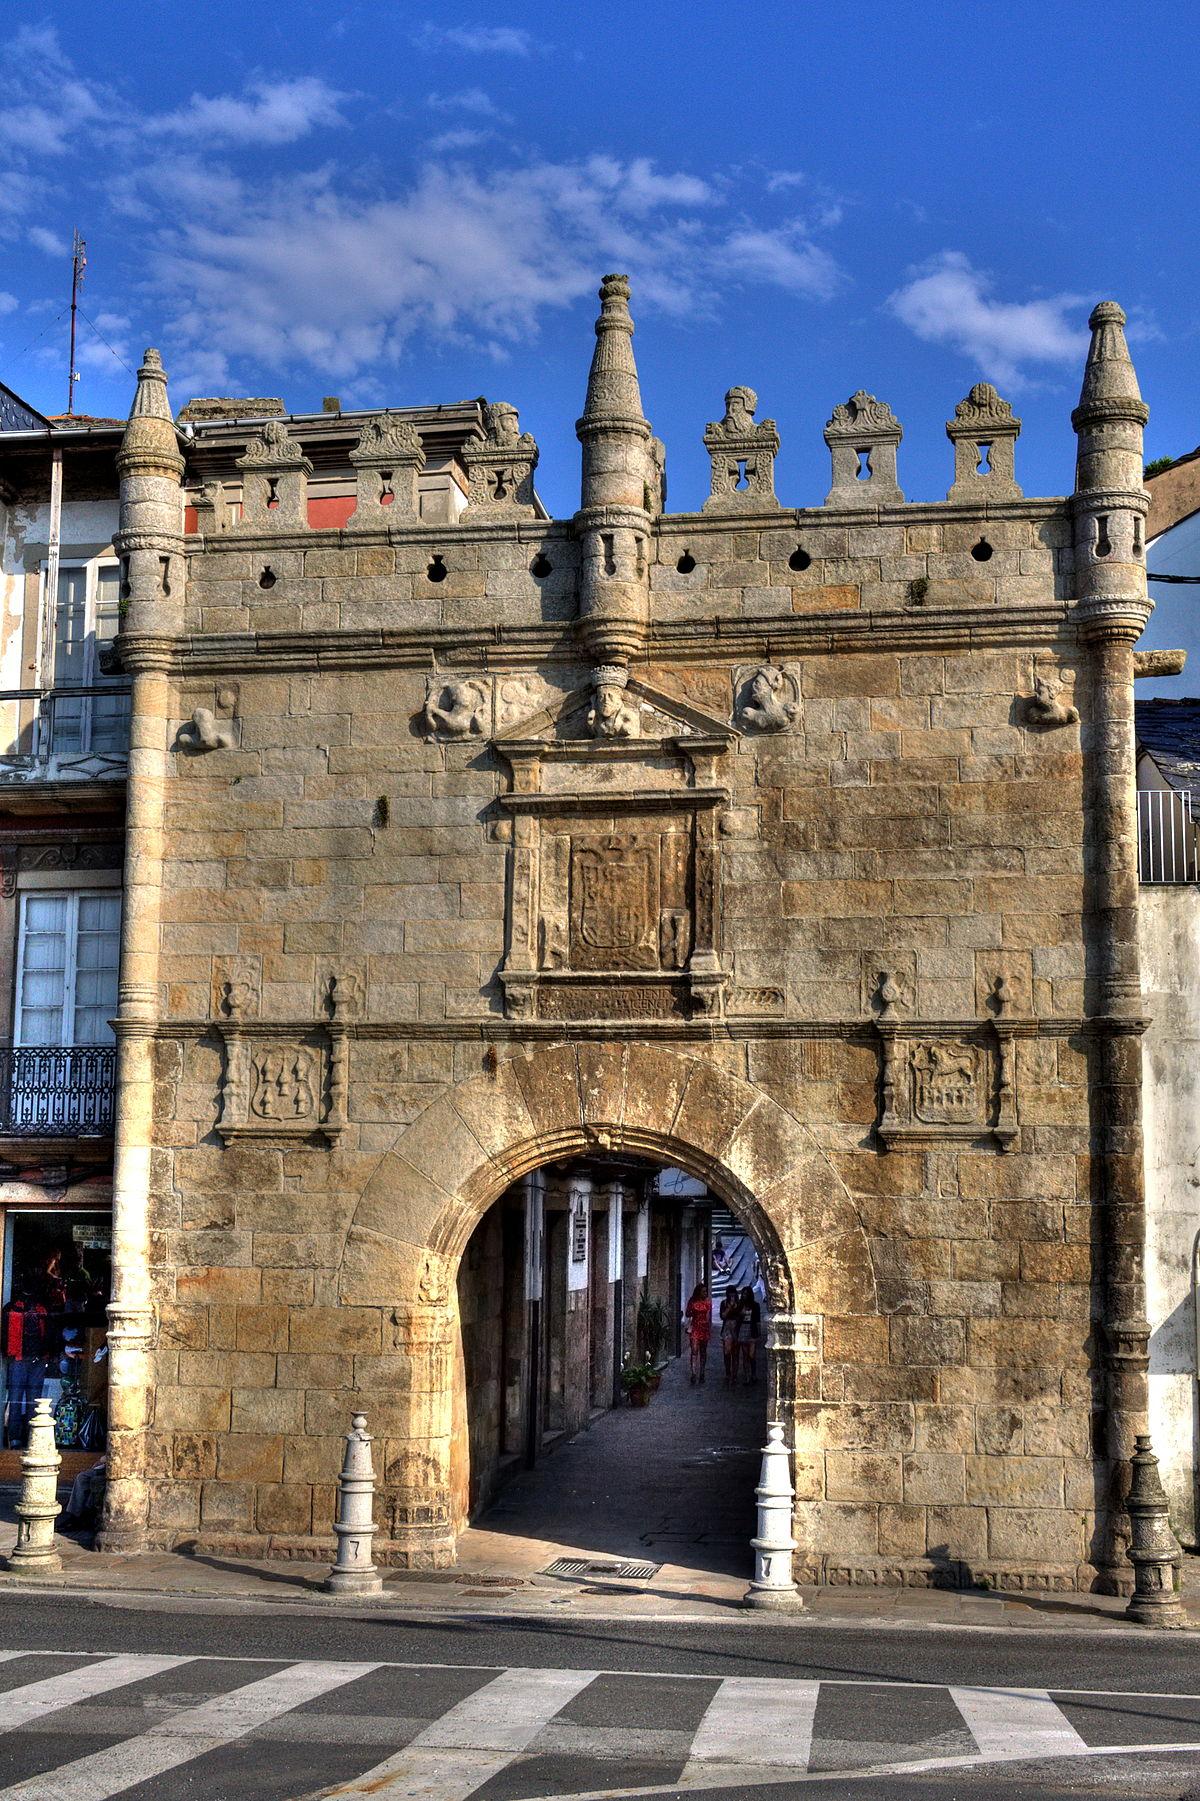 Puerta del castillo del puente wikipedia la - Porta carlo alberto treviso ...